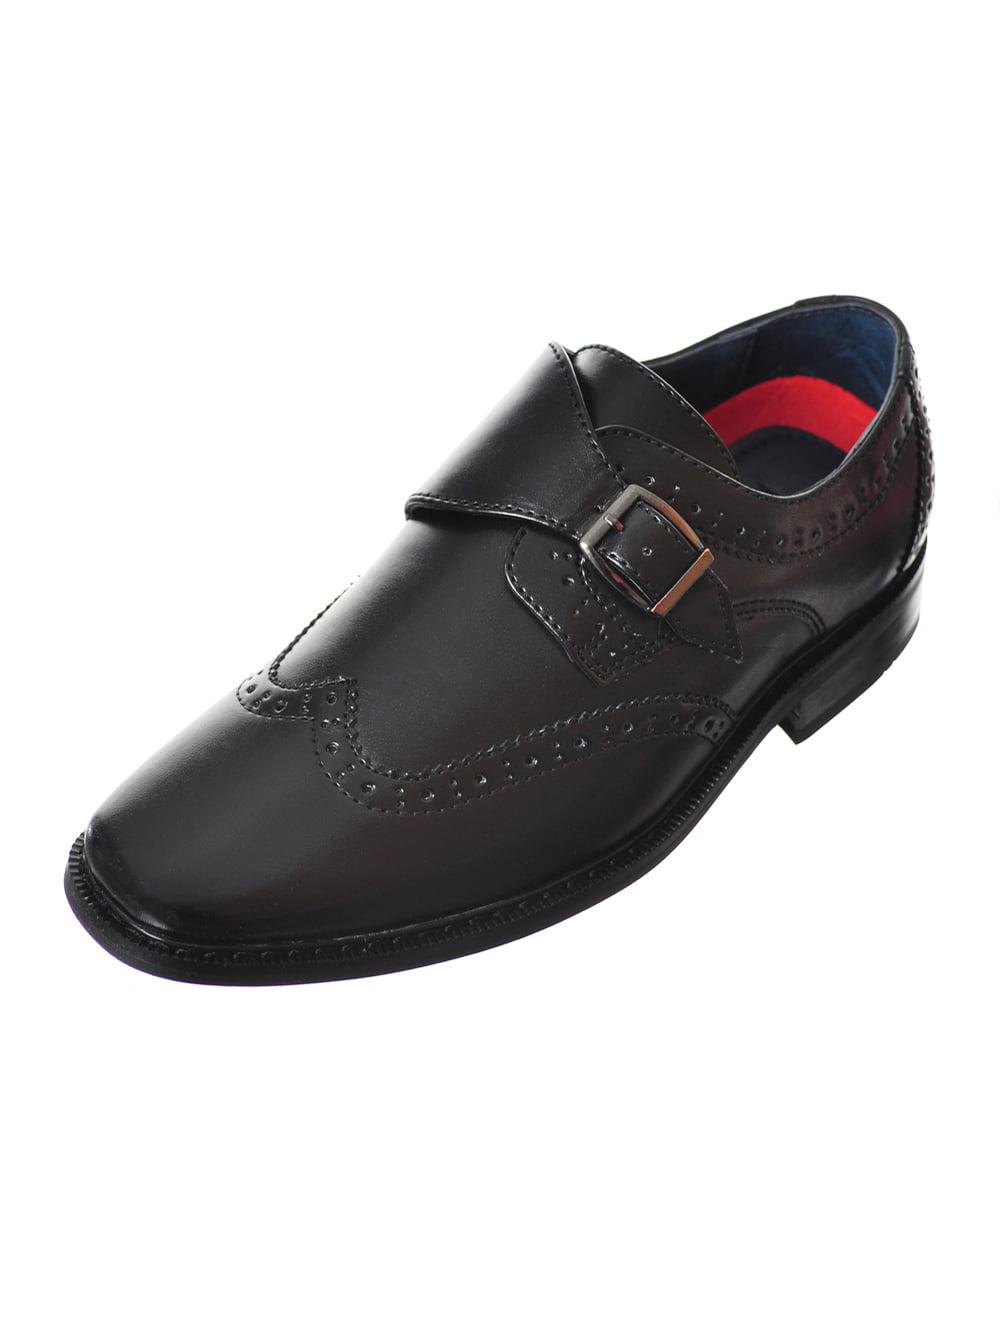 Boys' Dress Shoes (Sizes 9 - 8)